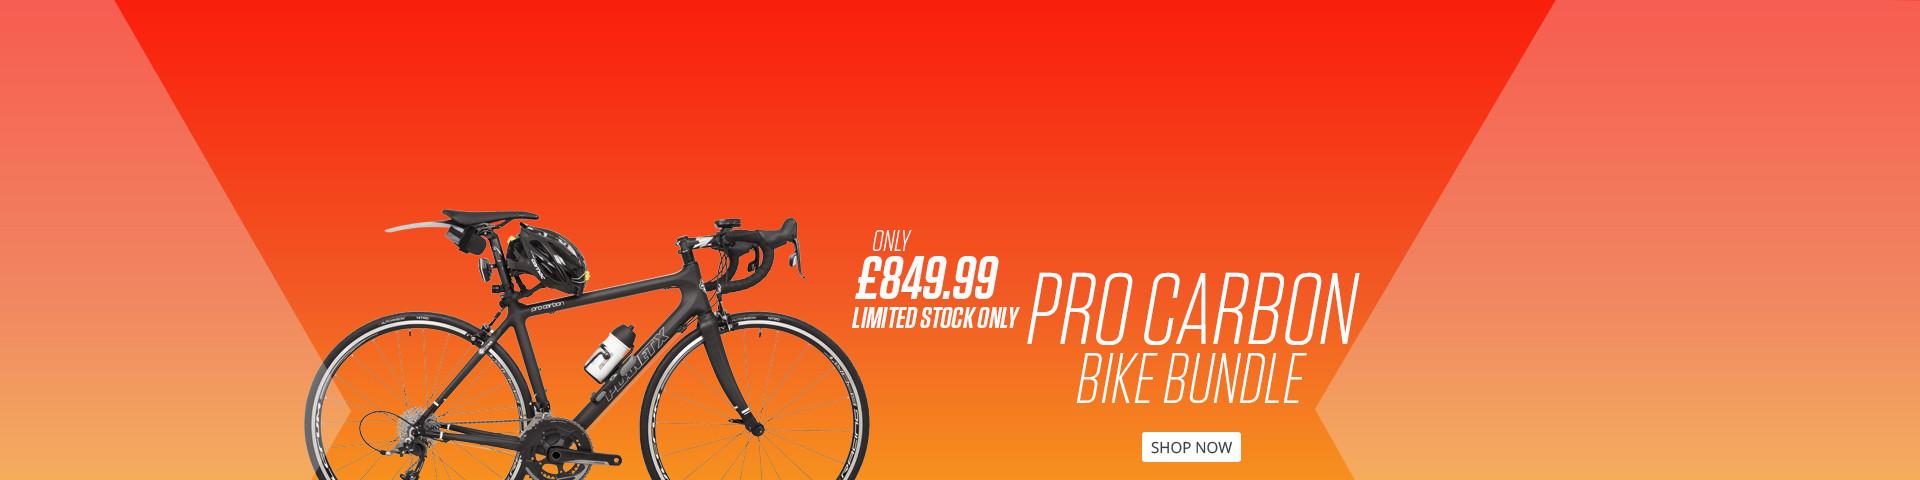 Fully Loaded Pro Carbon SRAM Rival Road Bike Bundle